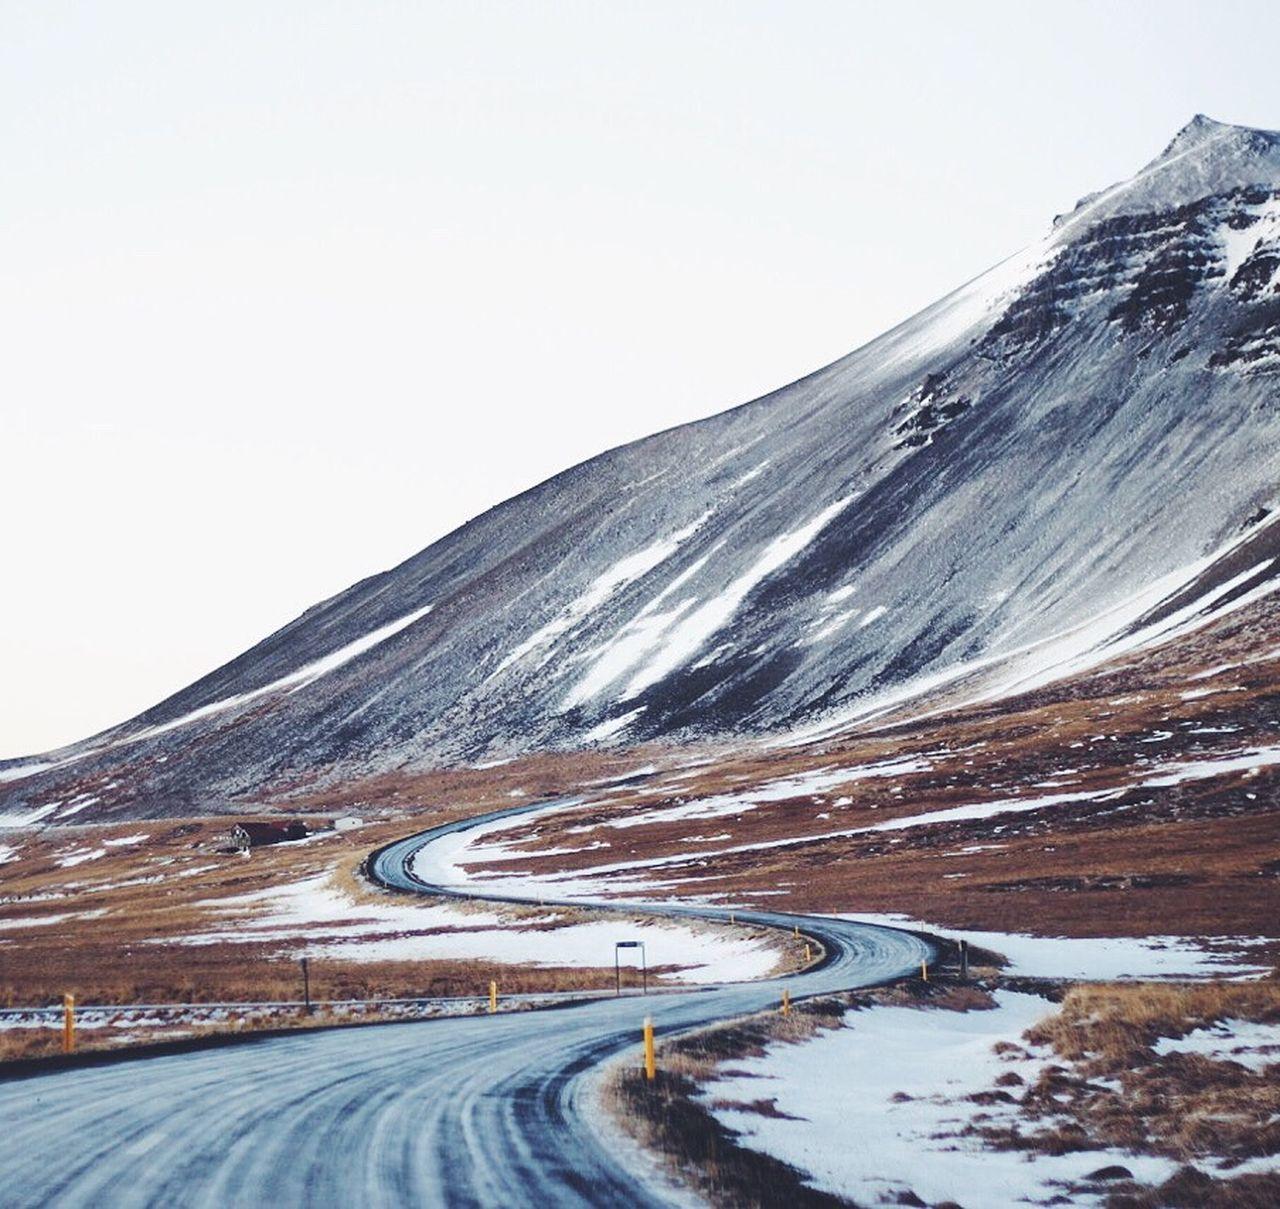 Beautiful stock photos of iceland, transportation, road, snow, winter